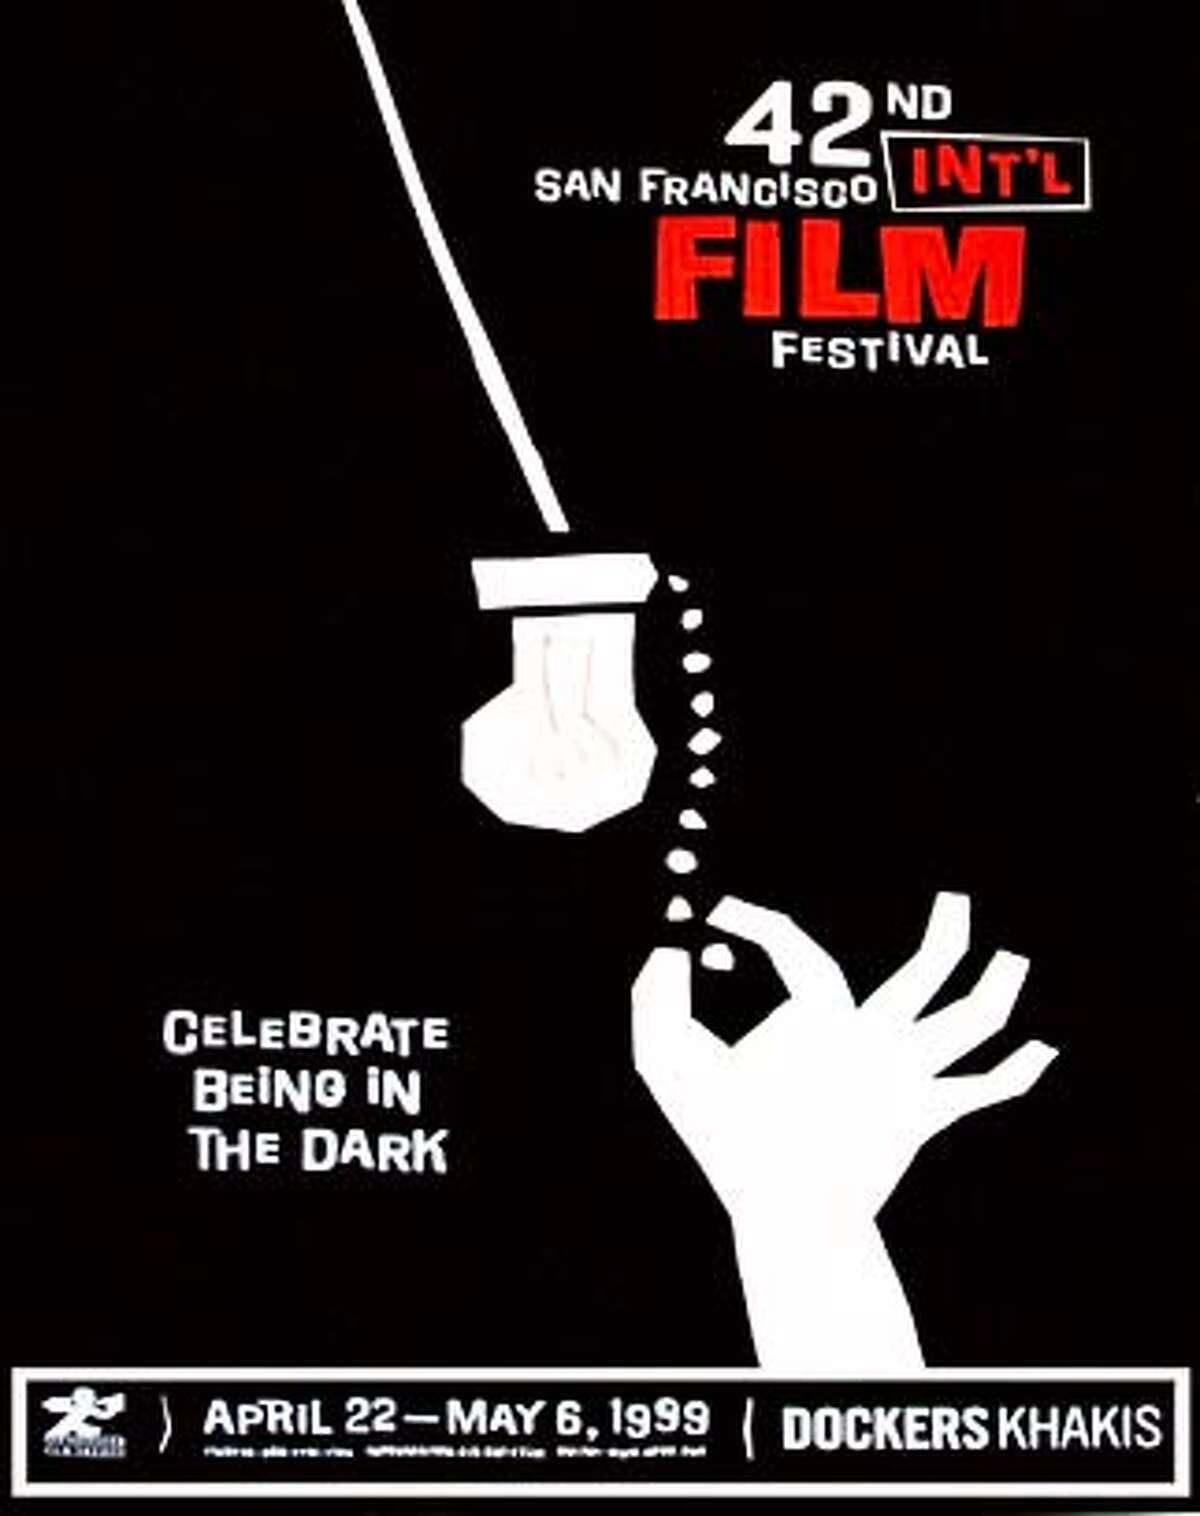 San Francisco International Film Festival poster